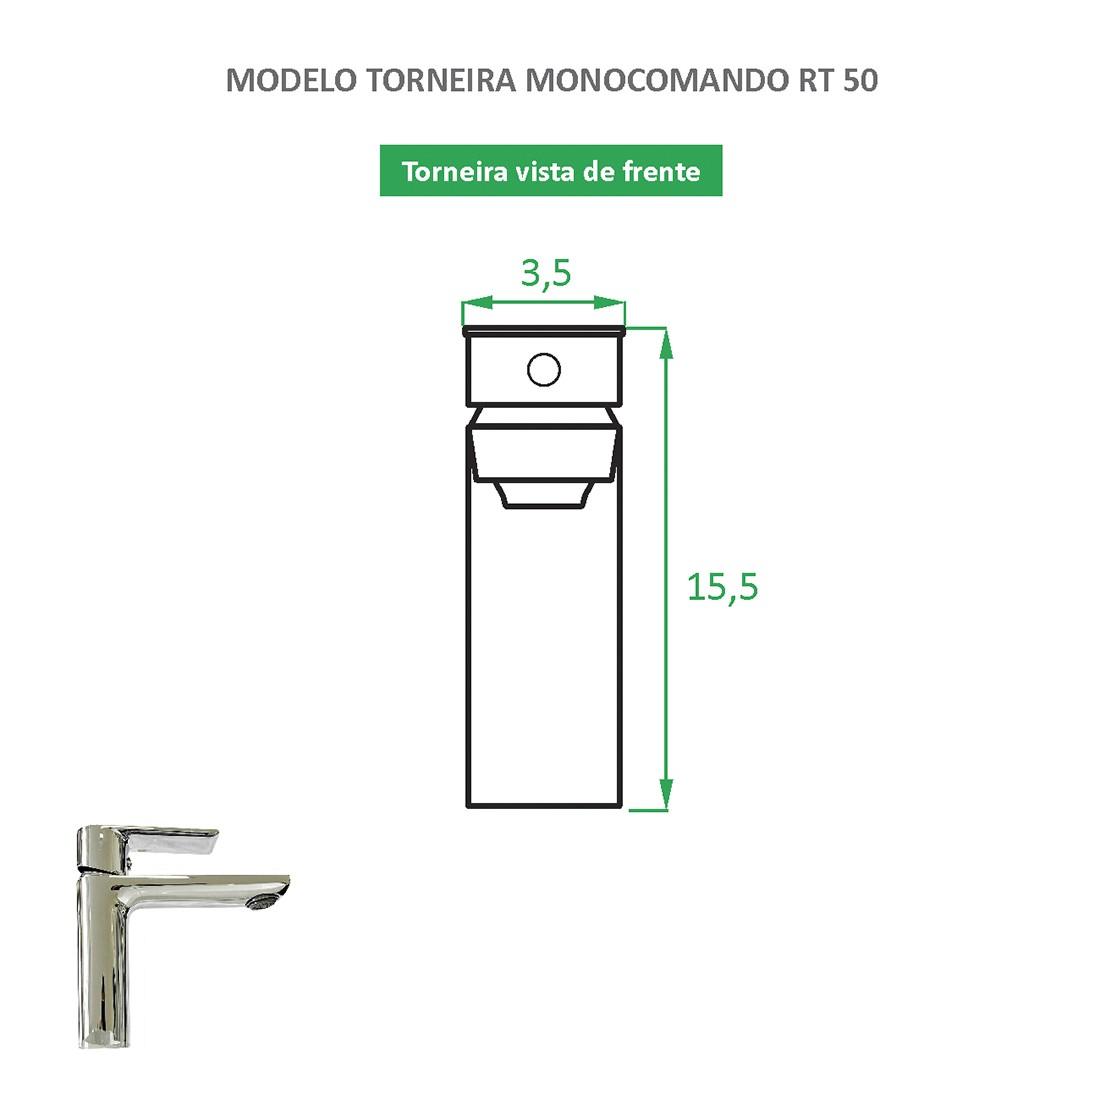 Torneira Monocomando Quadrada RT 50